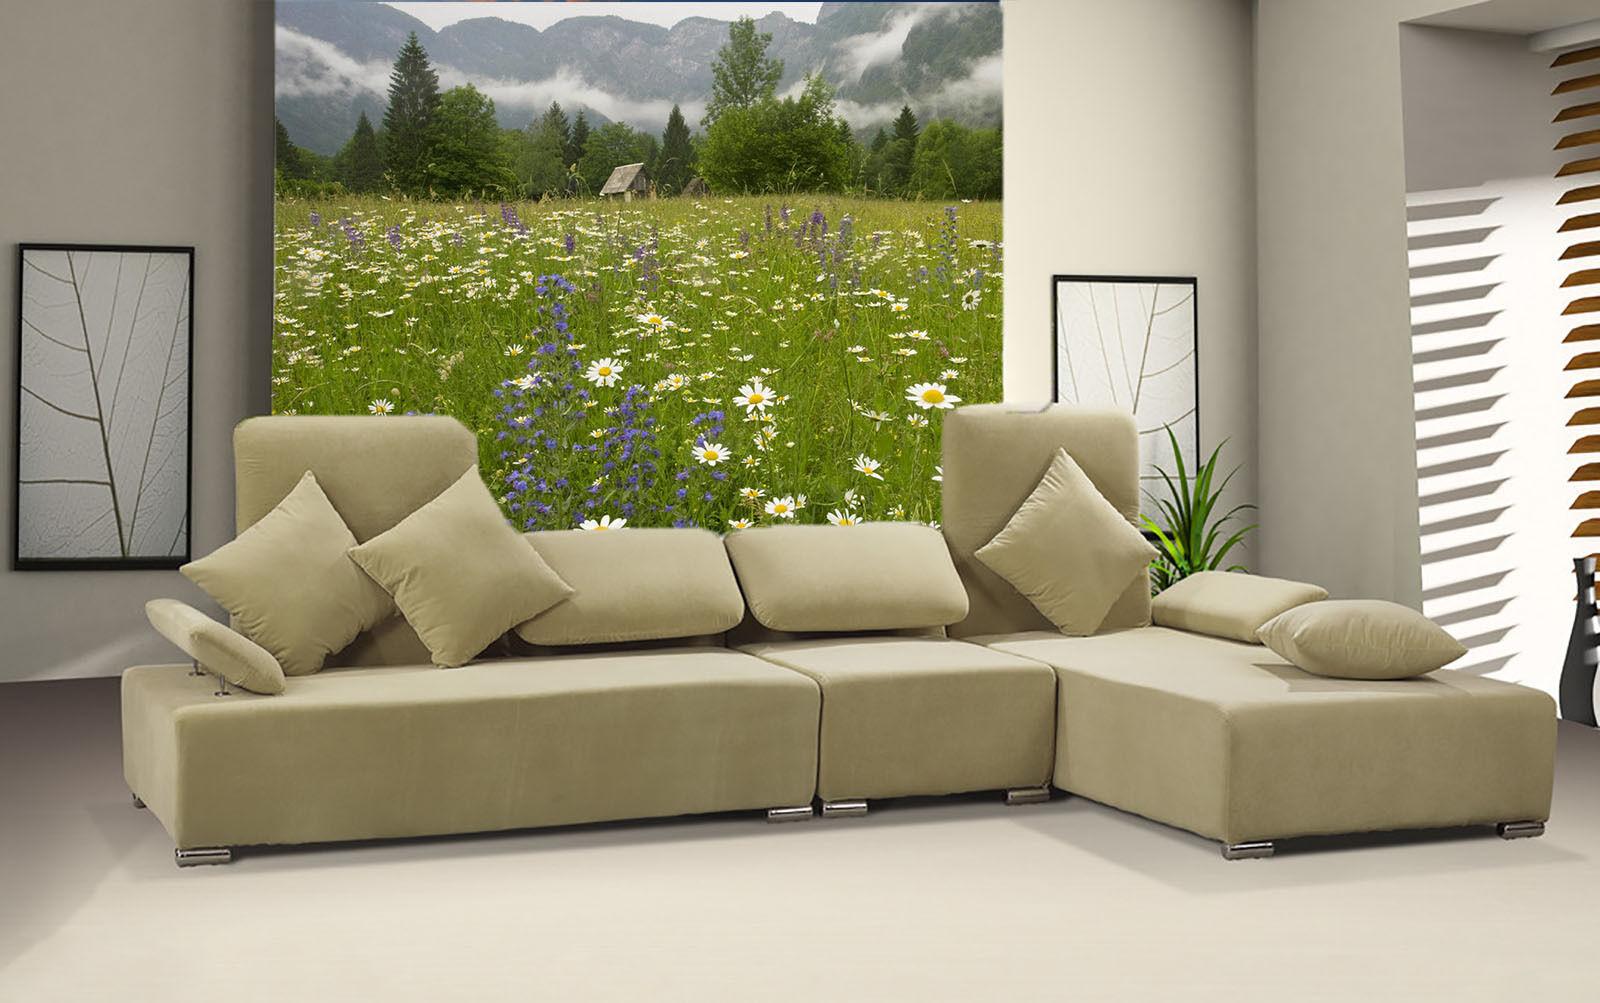 3D Landschaft im Nebel Garten Fototapeten Wandbild Fototapete BildTapete Familie